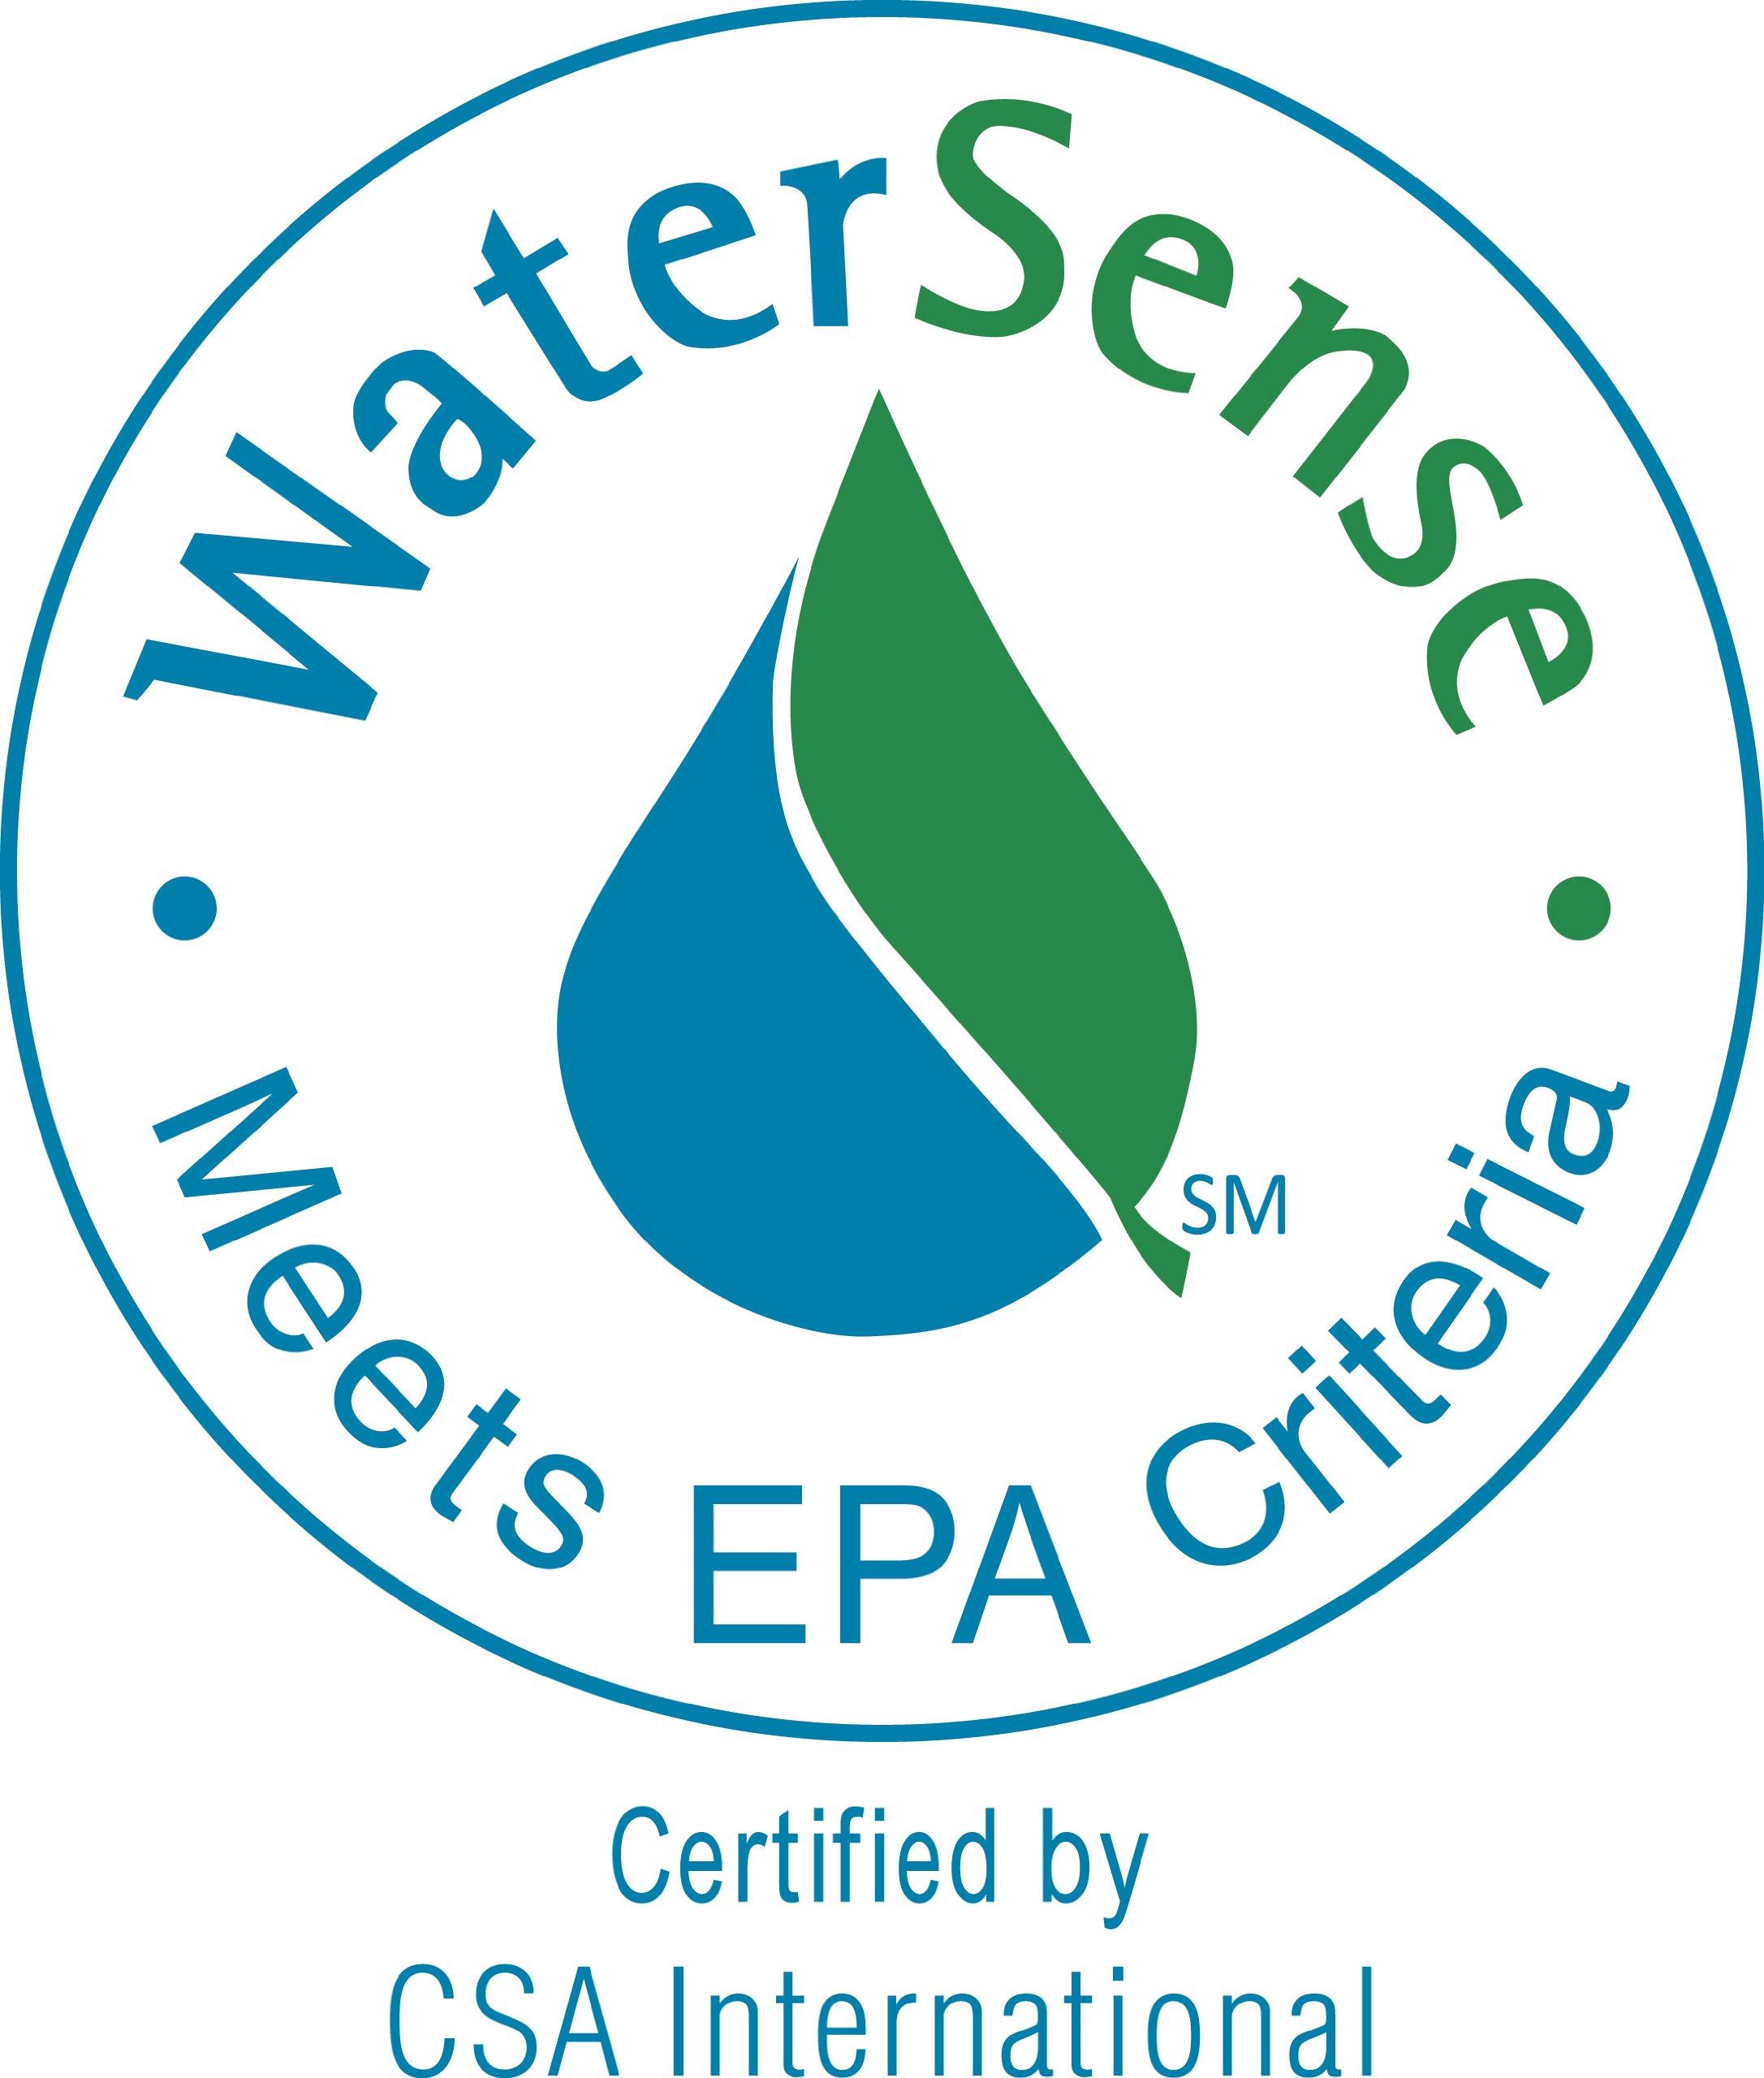 PF WaterWorks SmartFLOW Water Sense Listed Water Saving Efficient Three Spray Pattern Massaging Showerhead - 1.5 GPM; PF0555 by PF WaterWorks (Image #3)